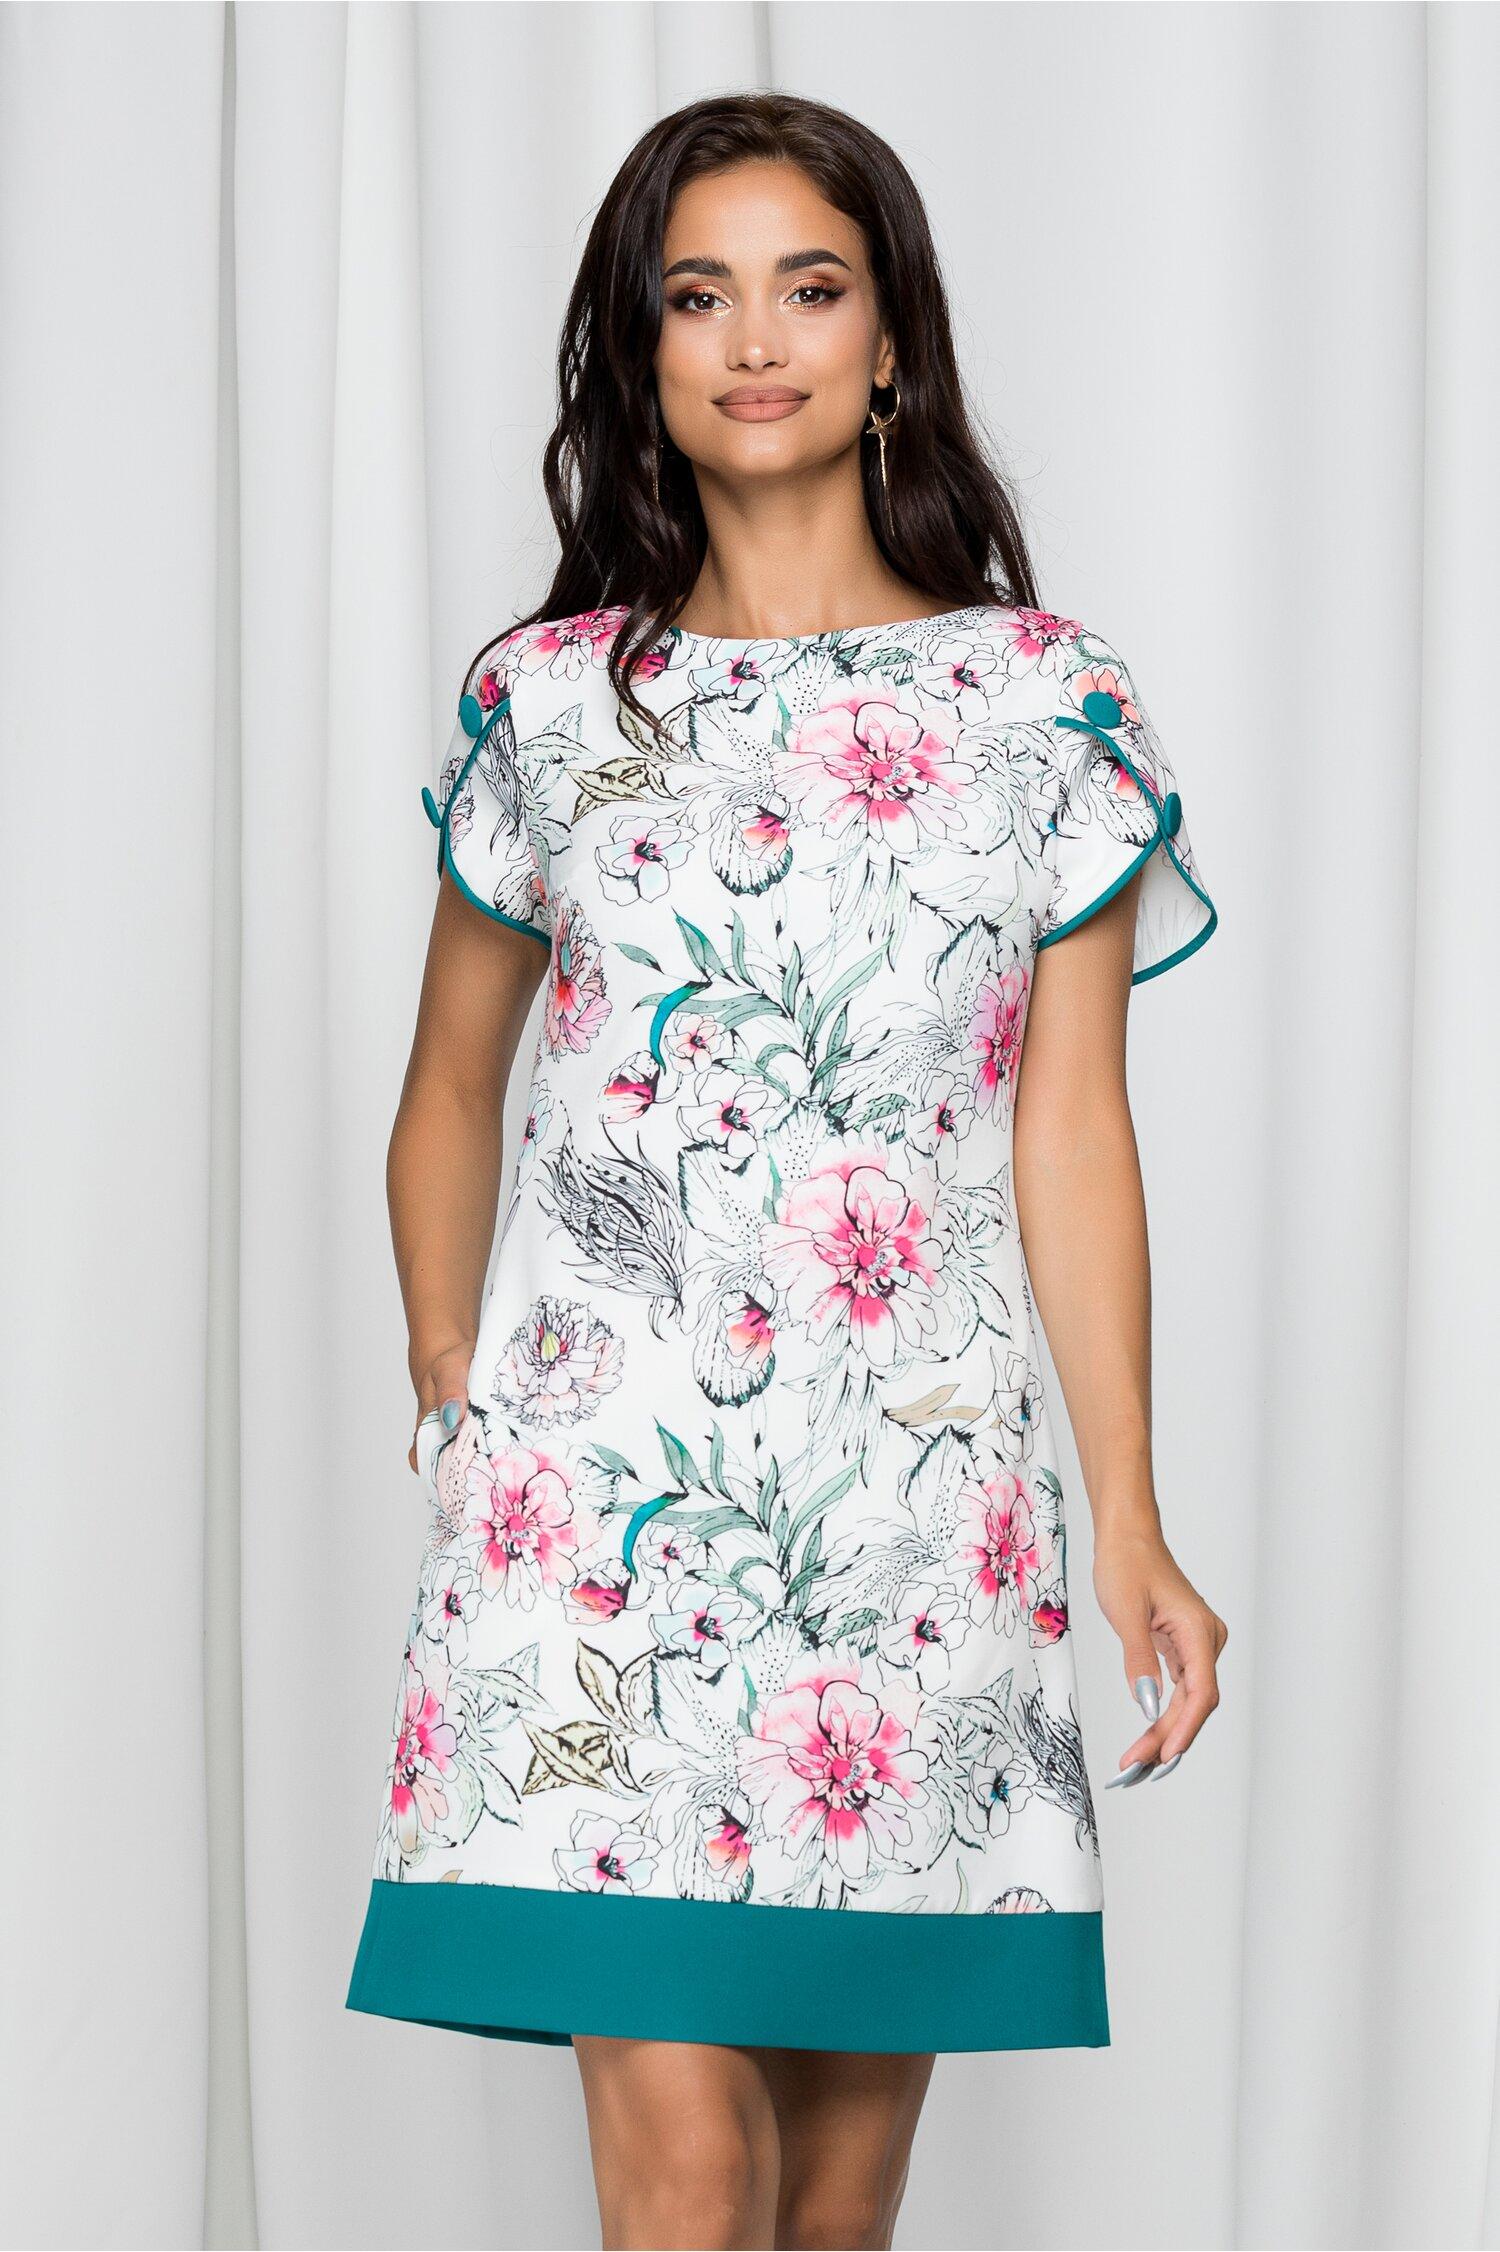 Rochie MBG alba cu imprimeu floral roz si baza turcoaz